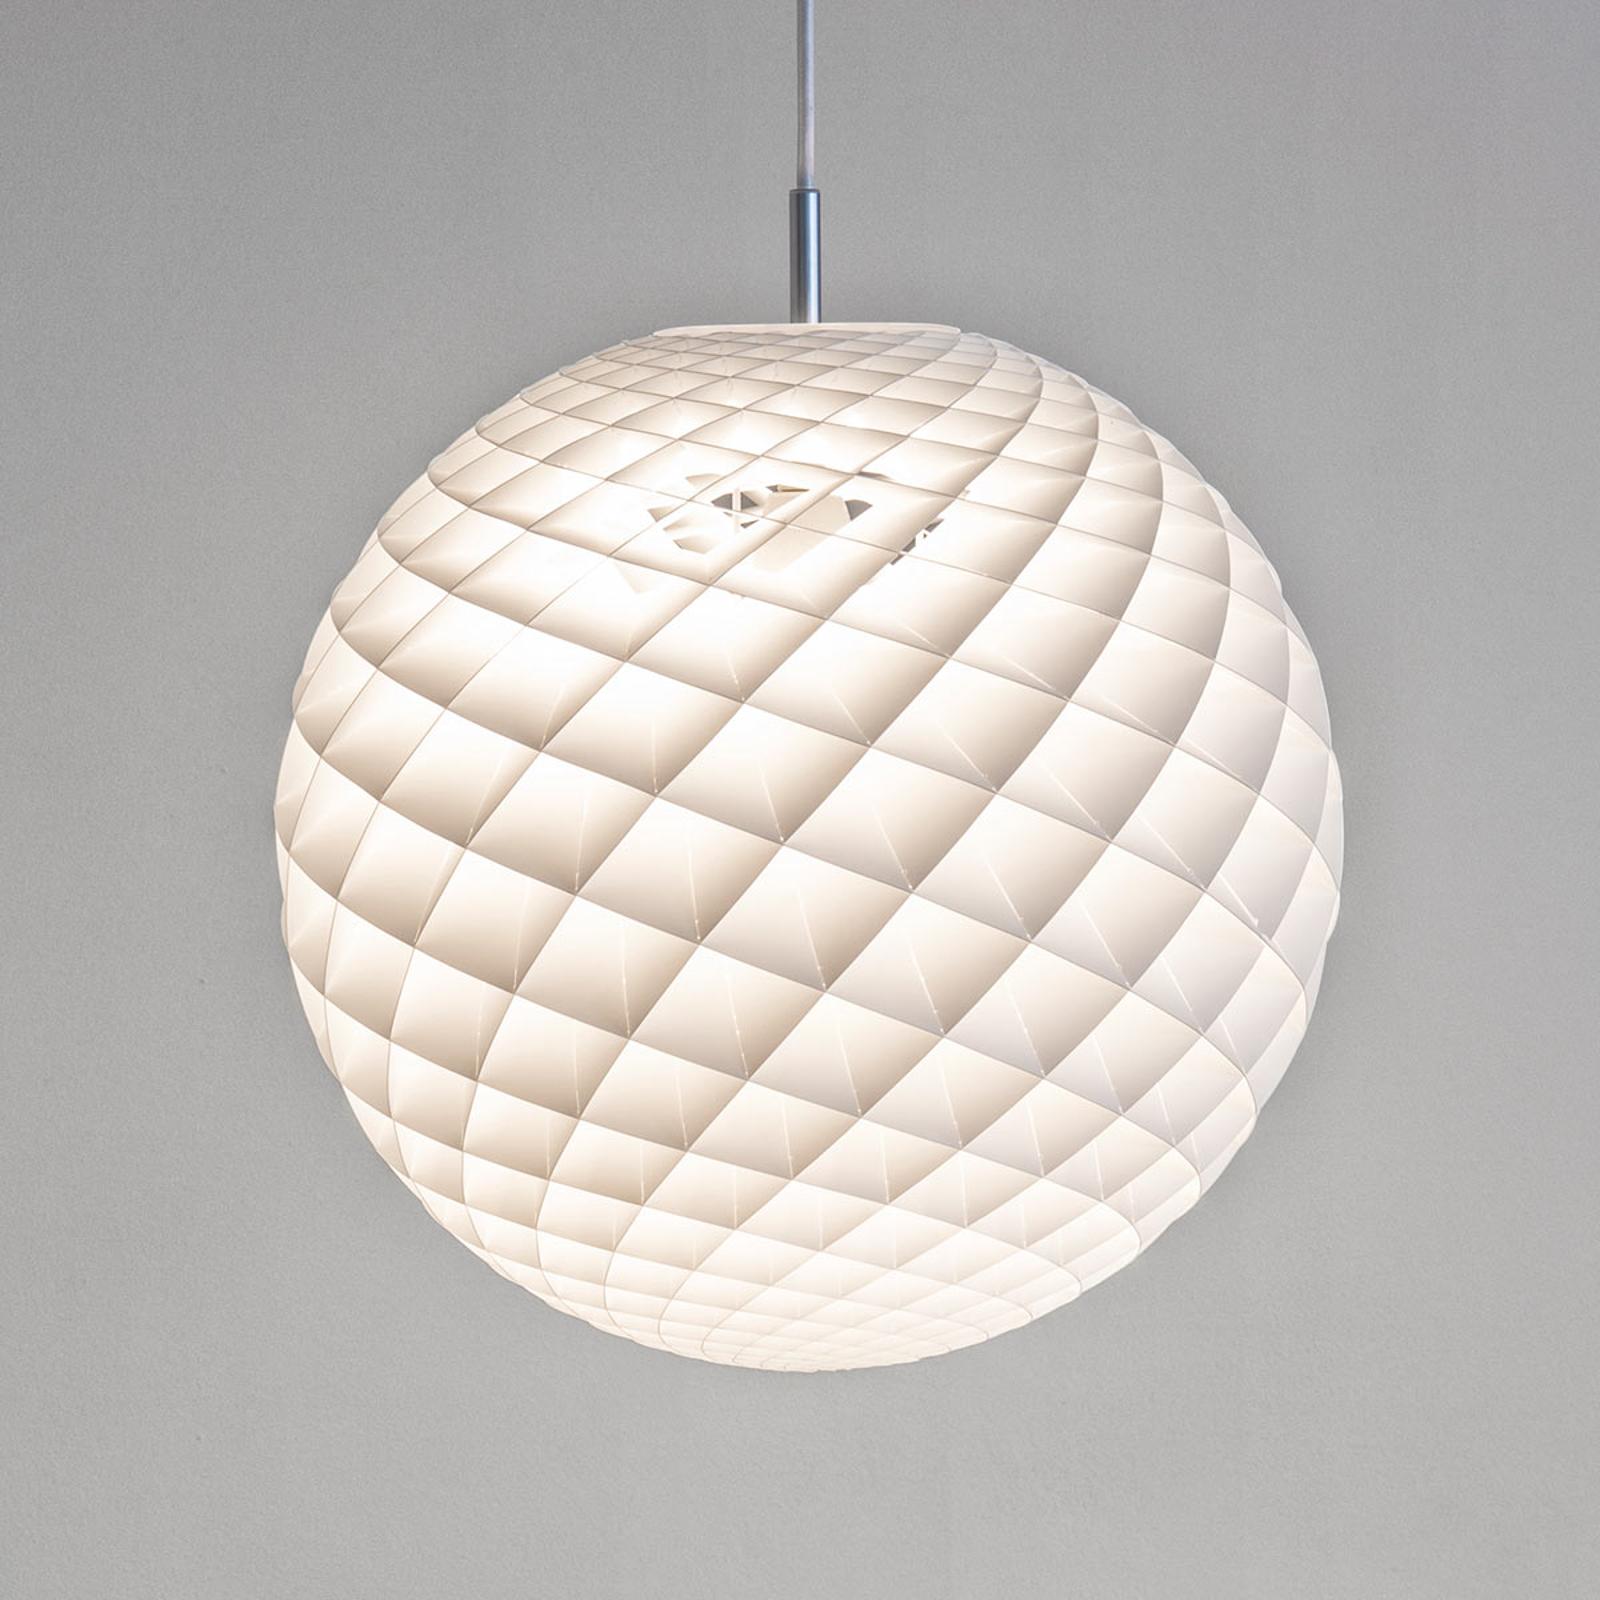 Louis Poulsen Patera Pendellampe  weiß matt 45 cm